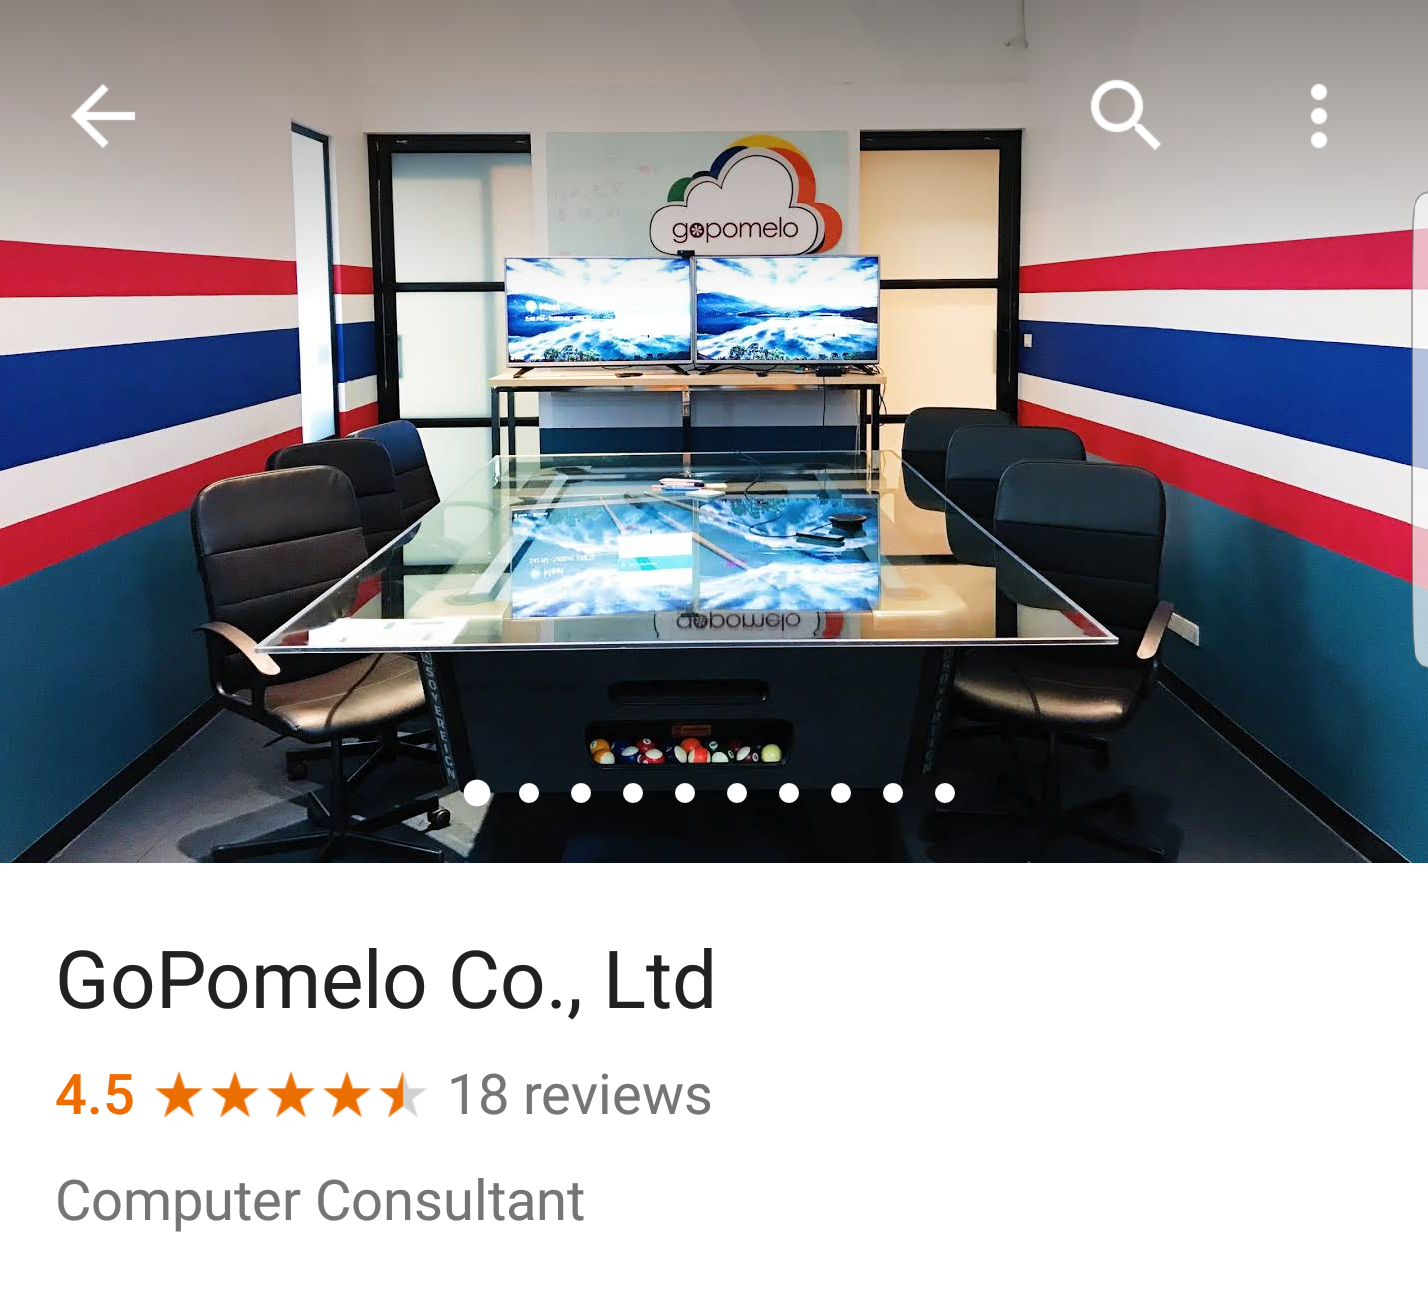 Google Maps Store Location